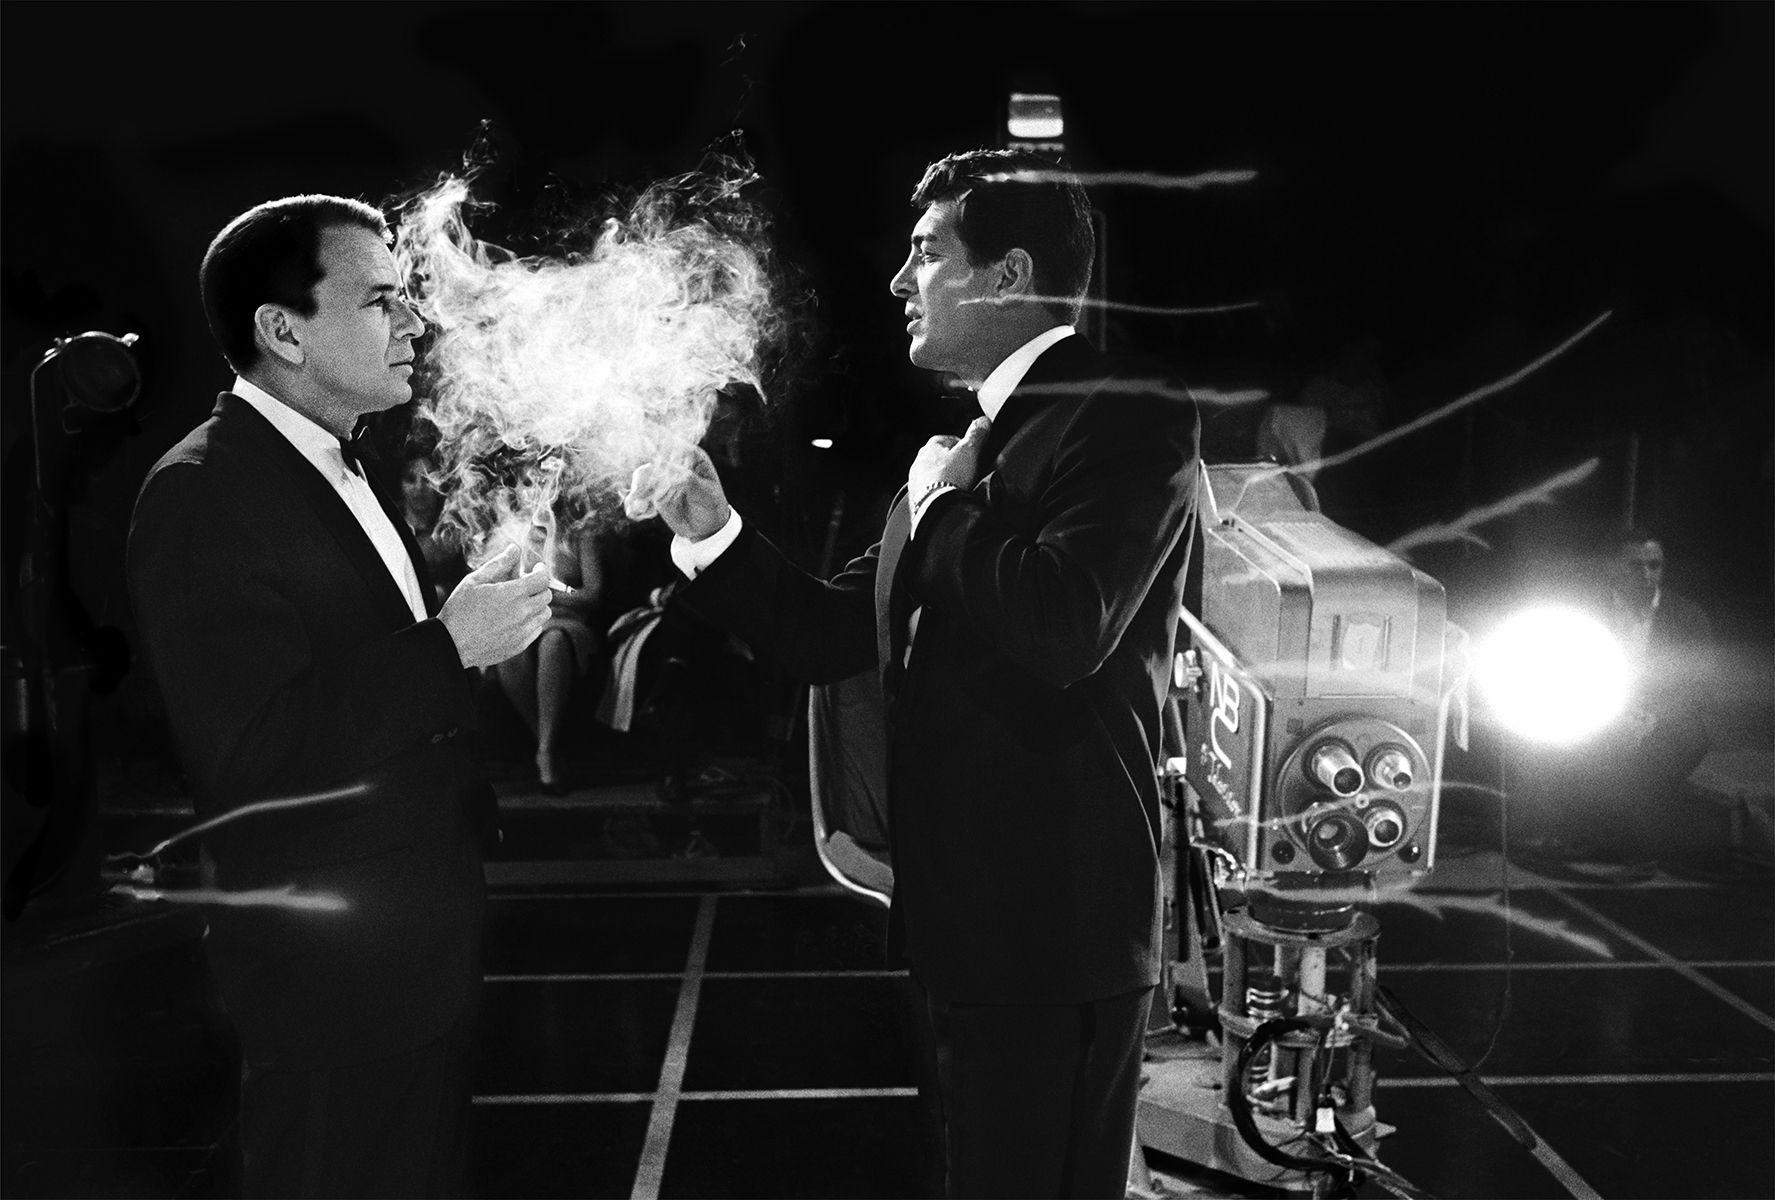 Frank Sinatra & Dean Martin, Smoke